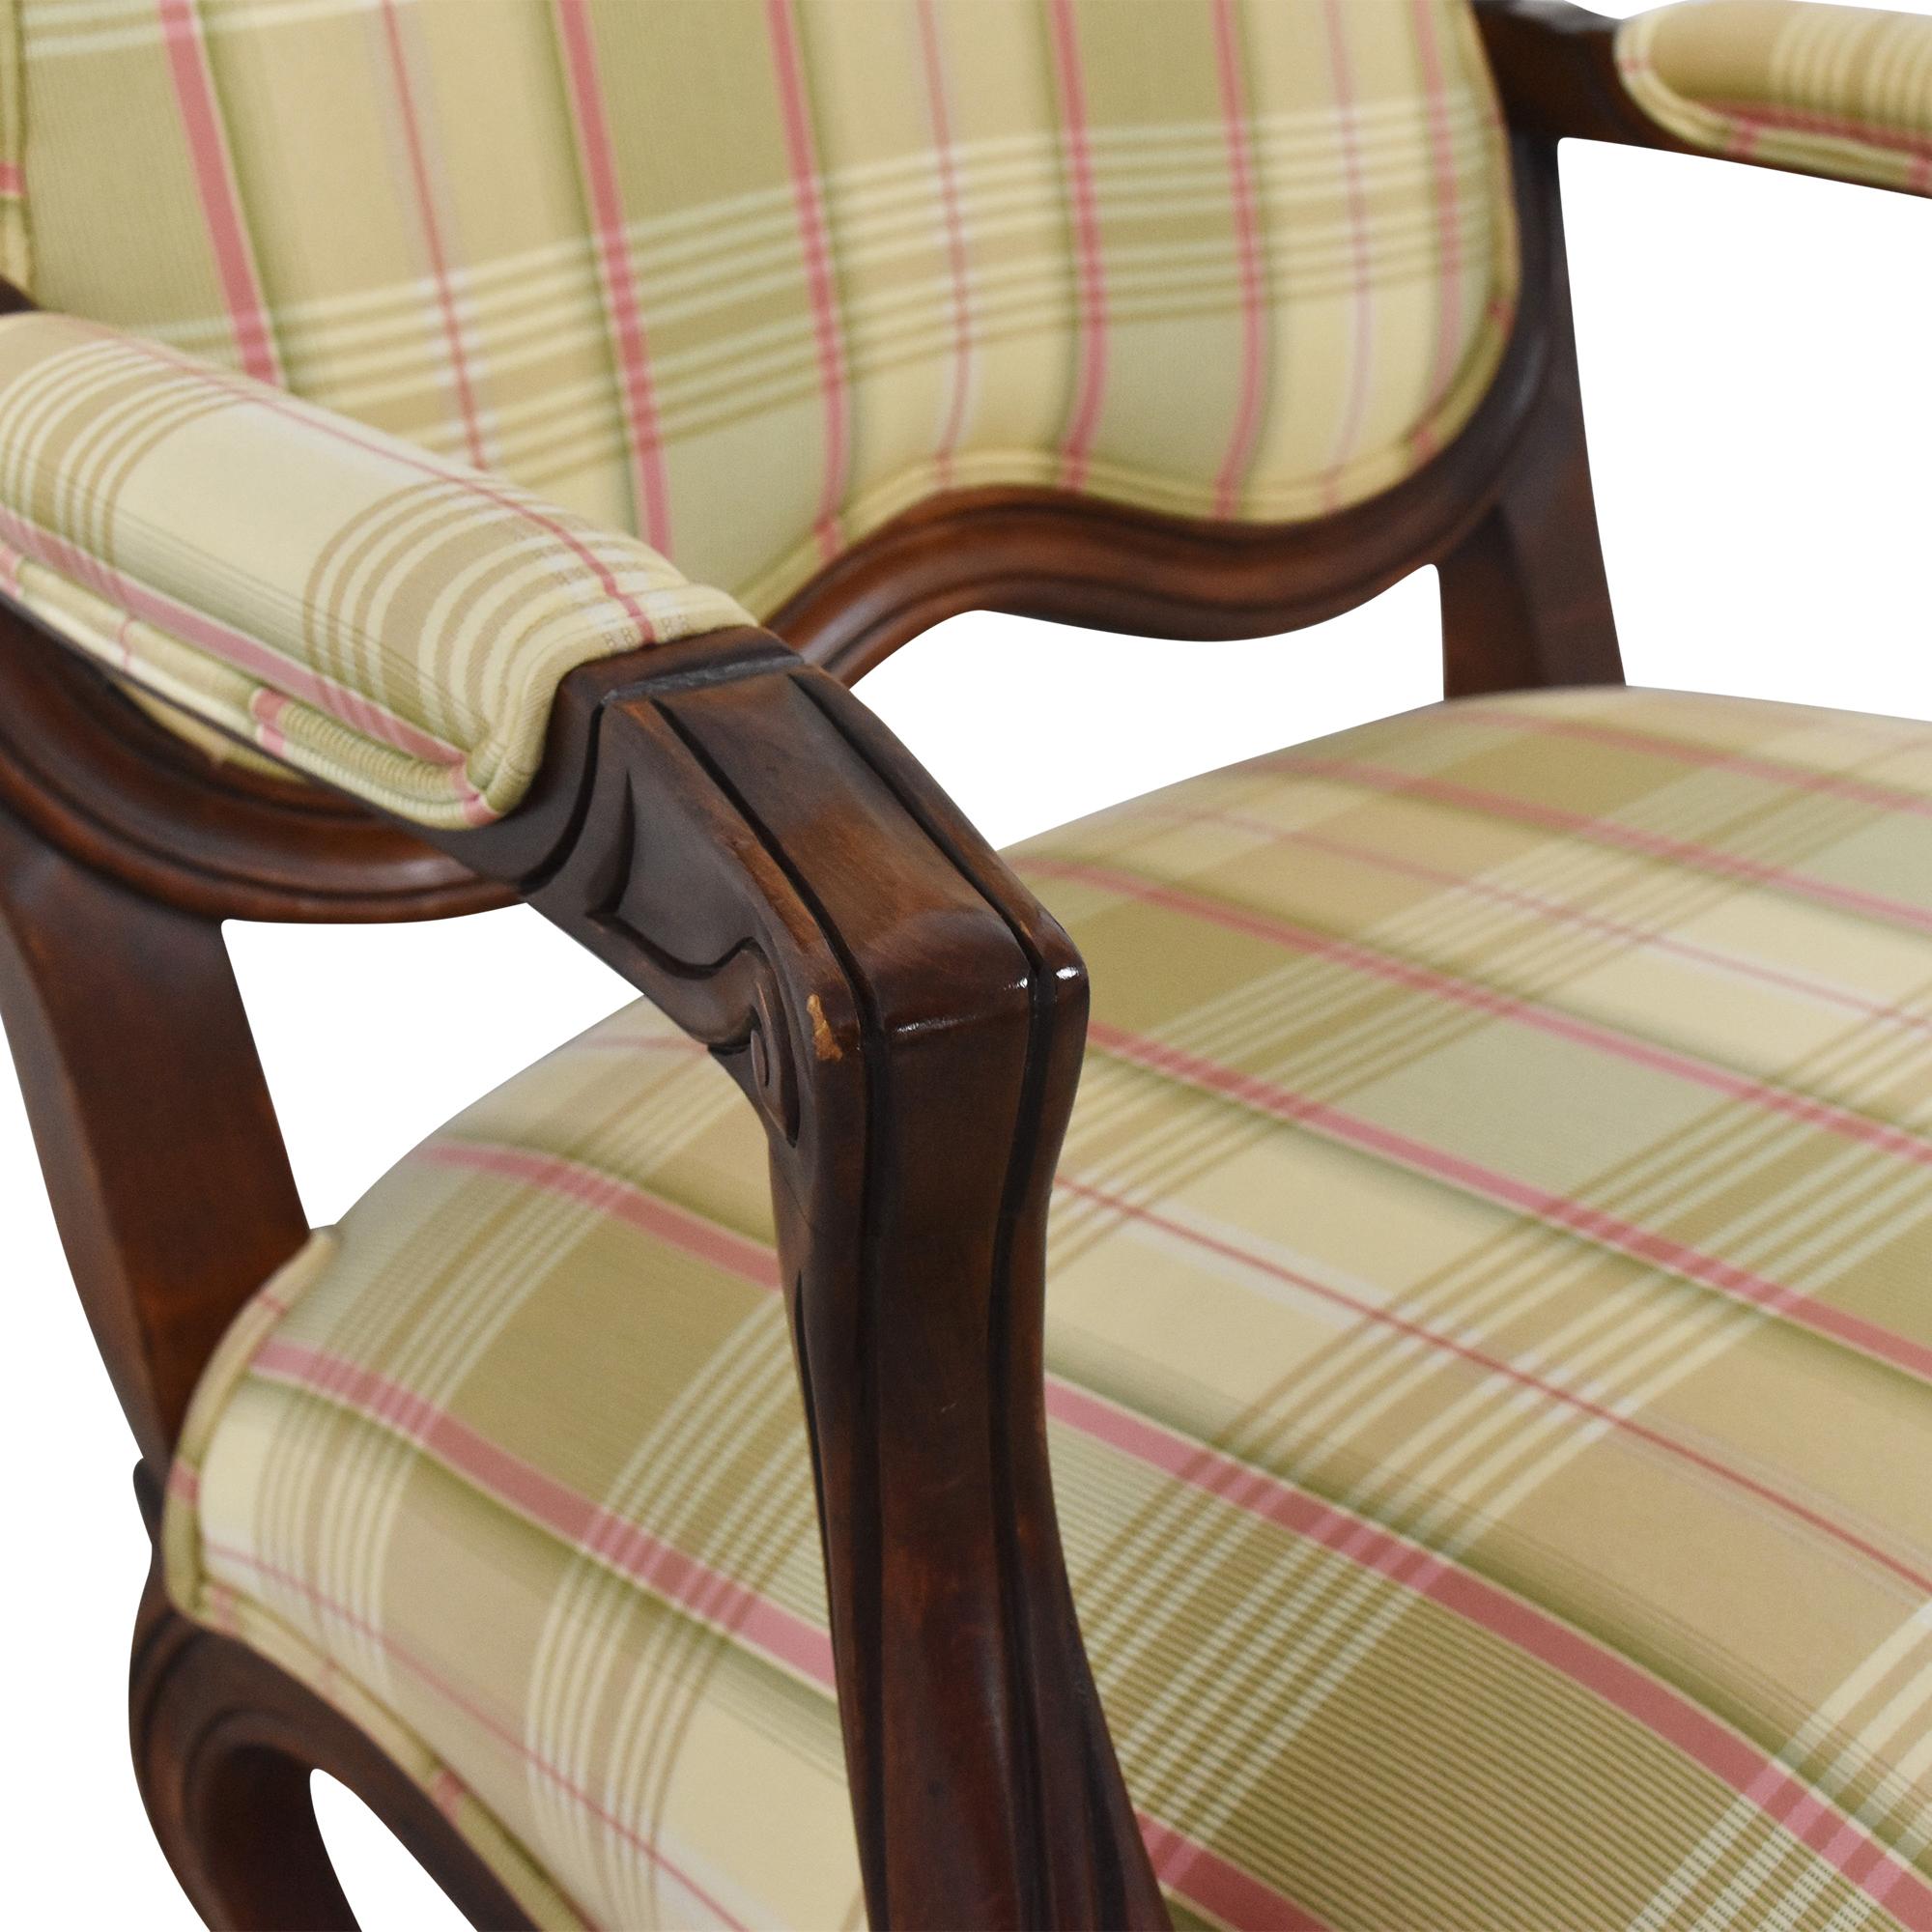 Ethan Allen Ethan Allen Chantel Chair dimensions